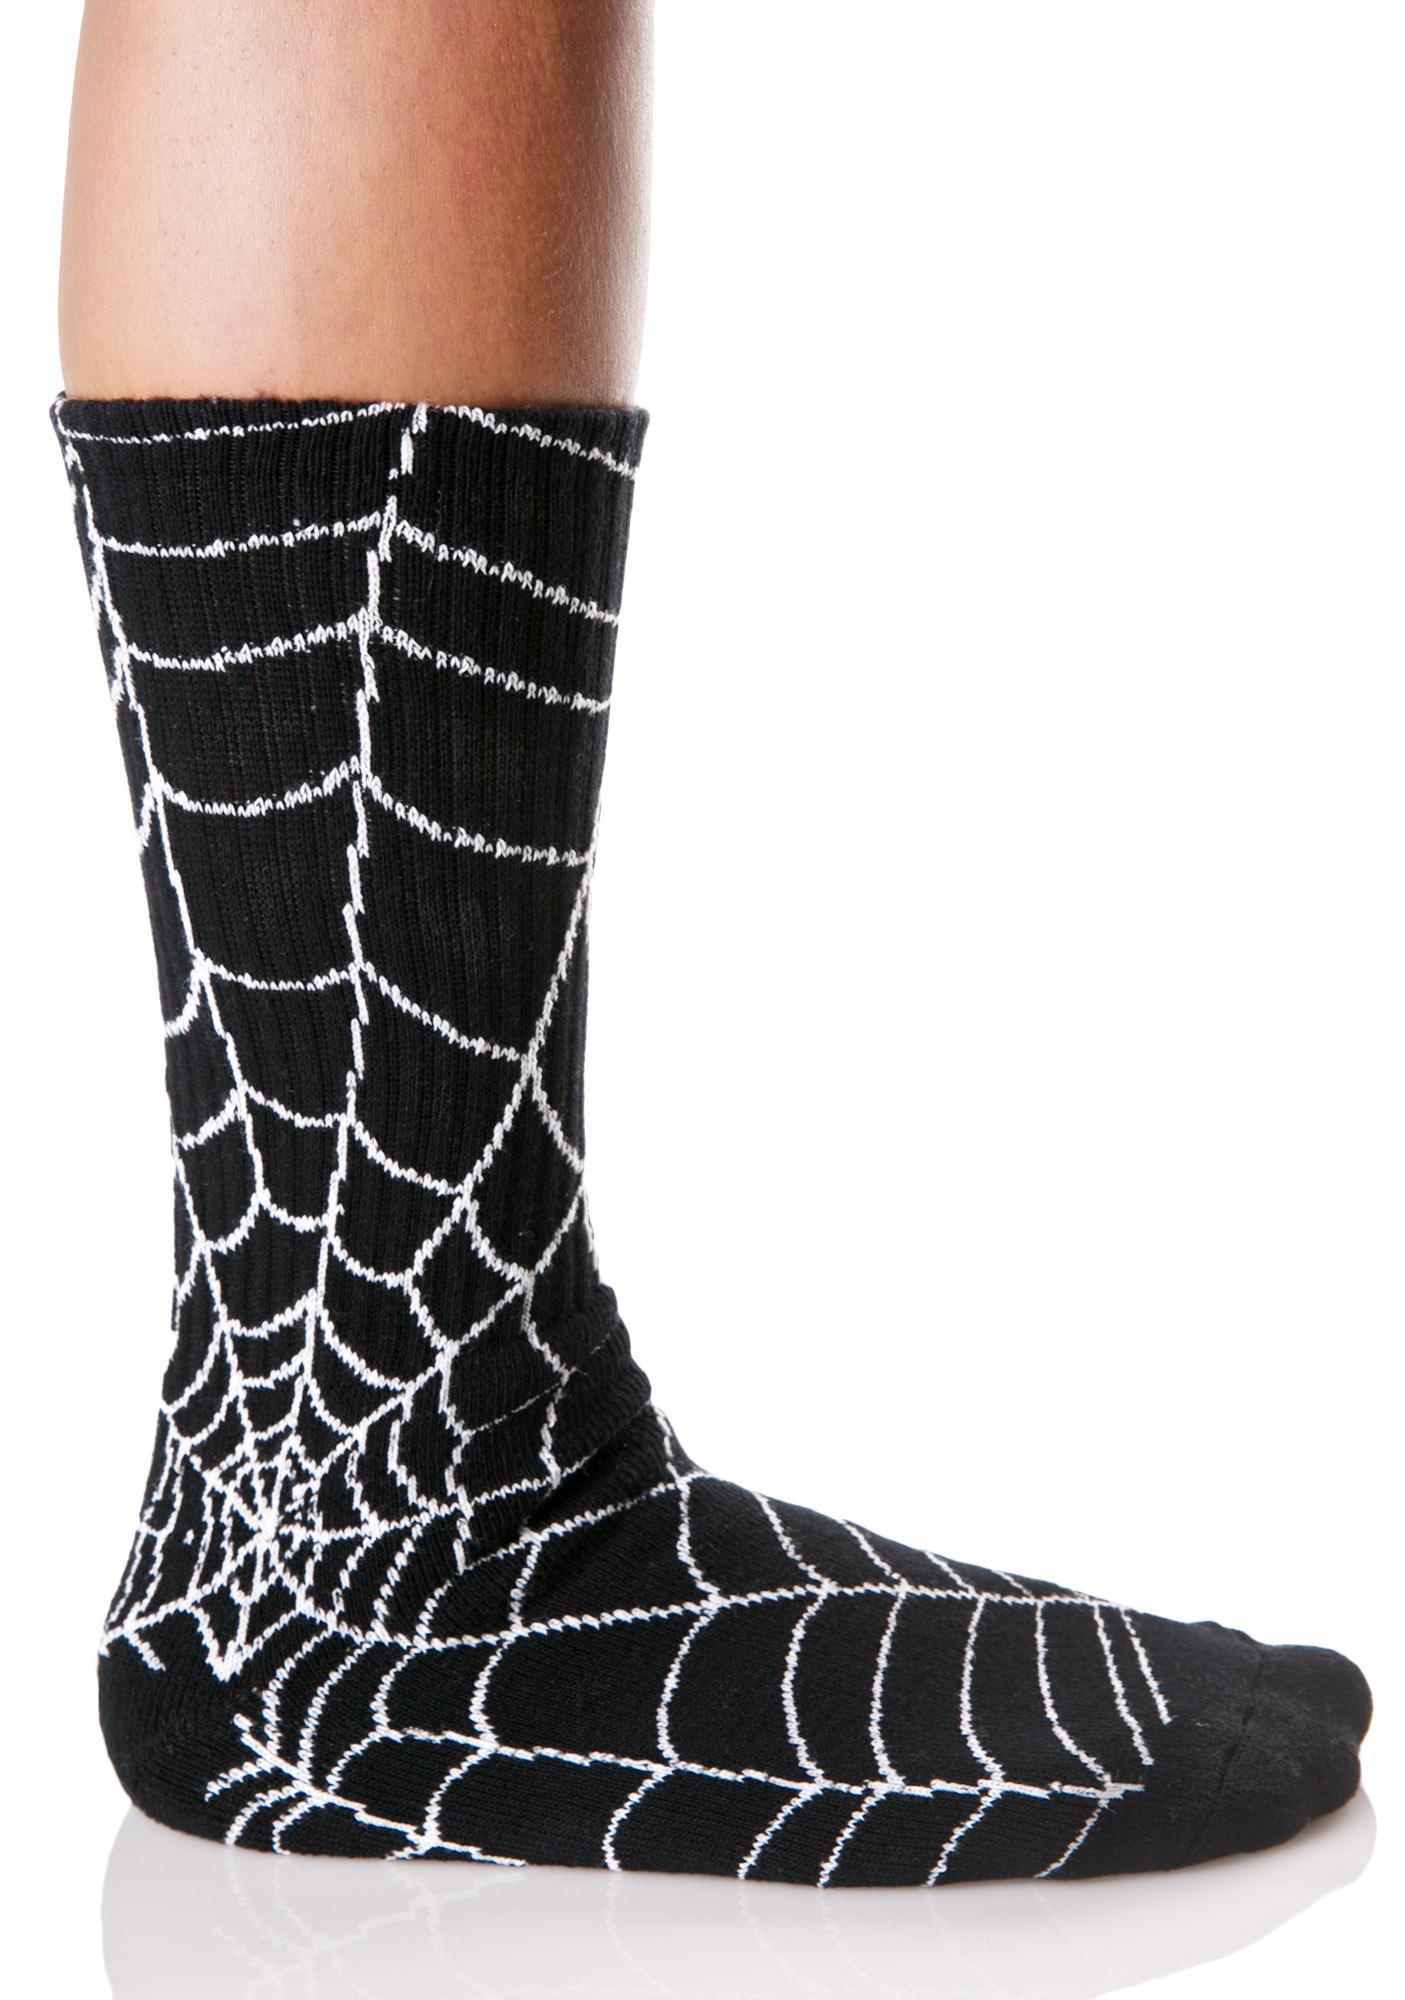 Odd Sox Spider Web Socks